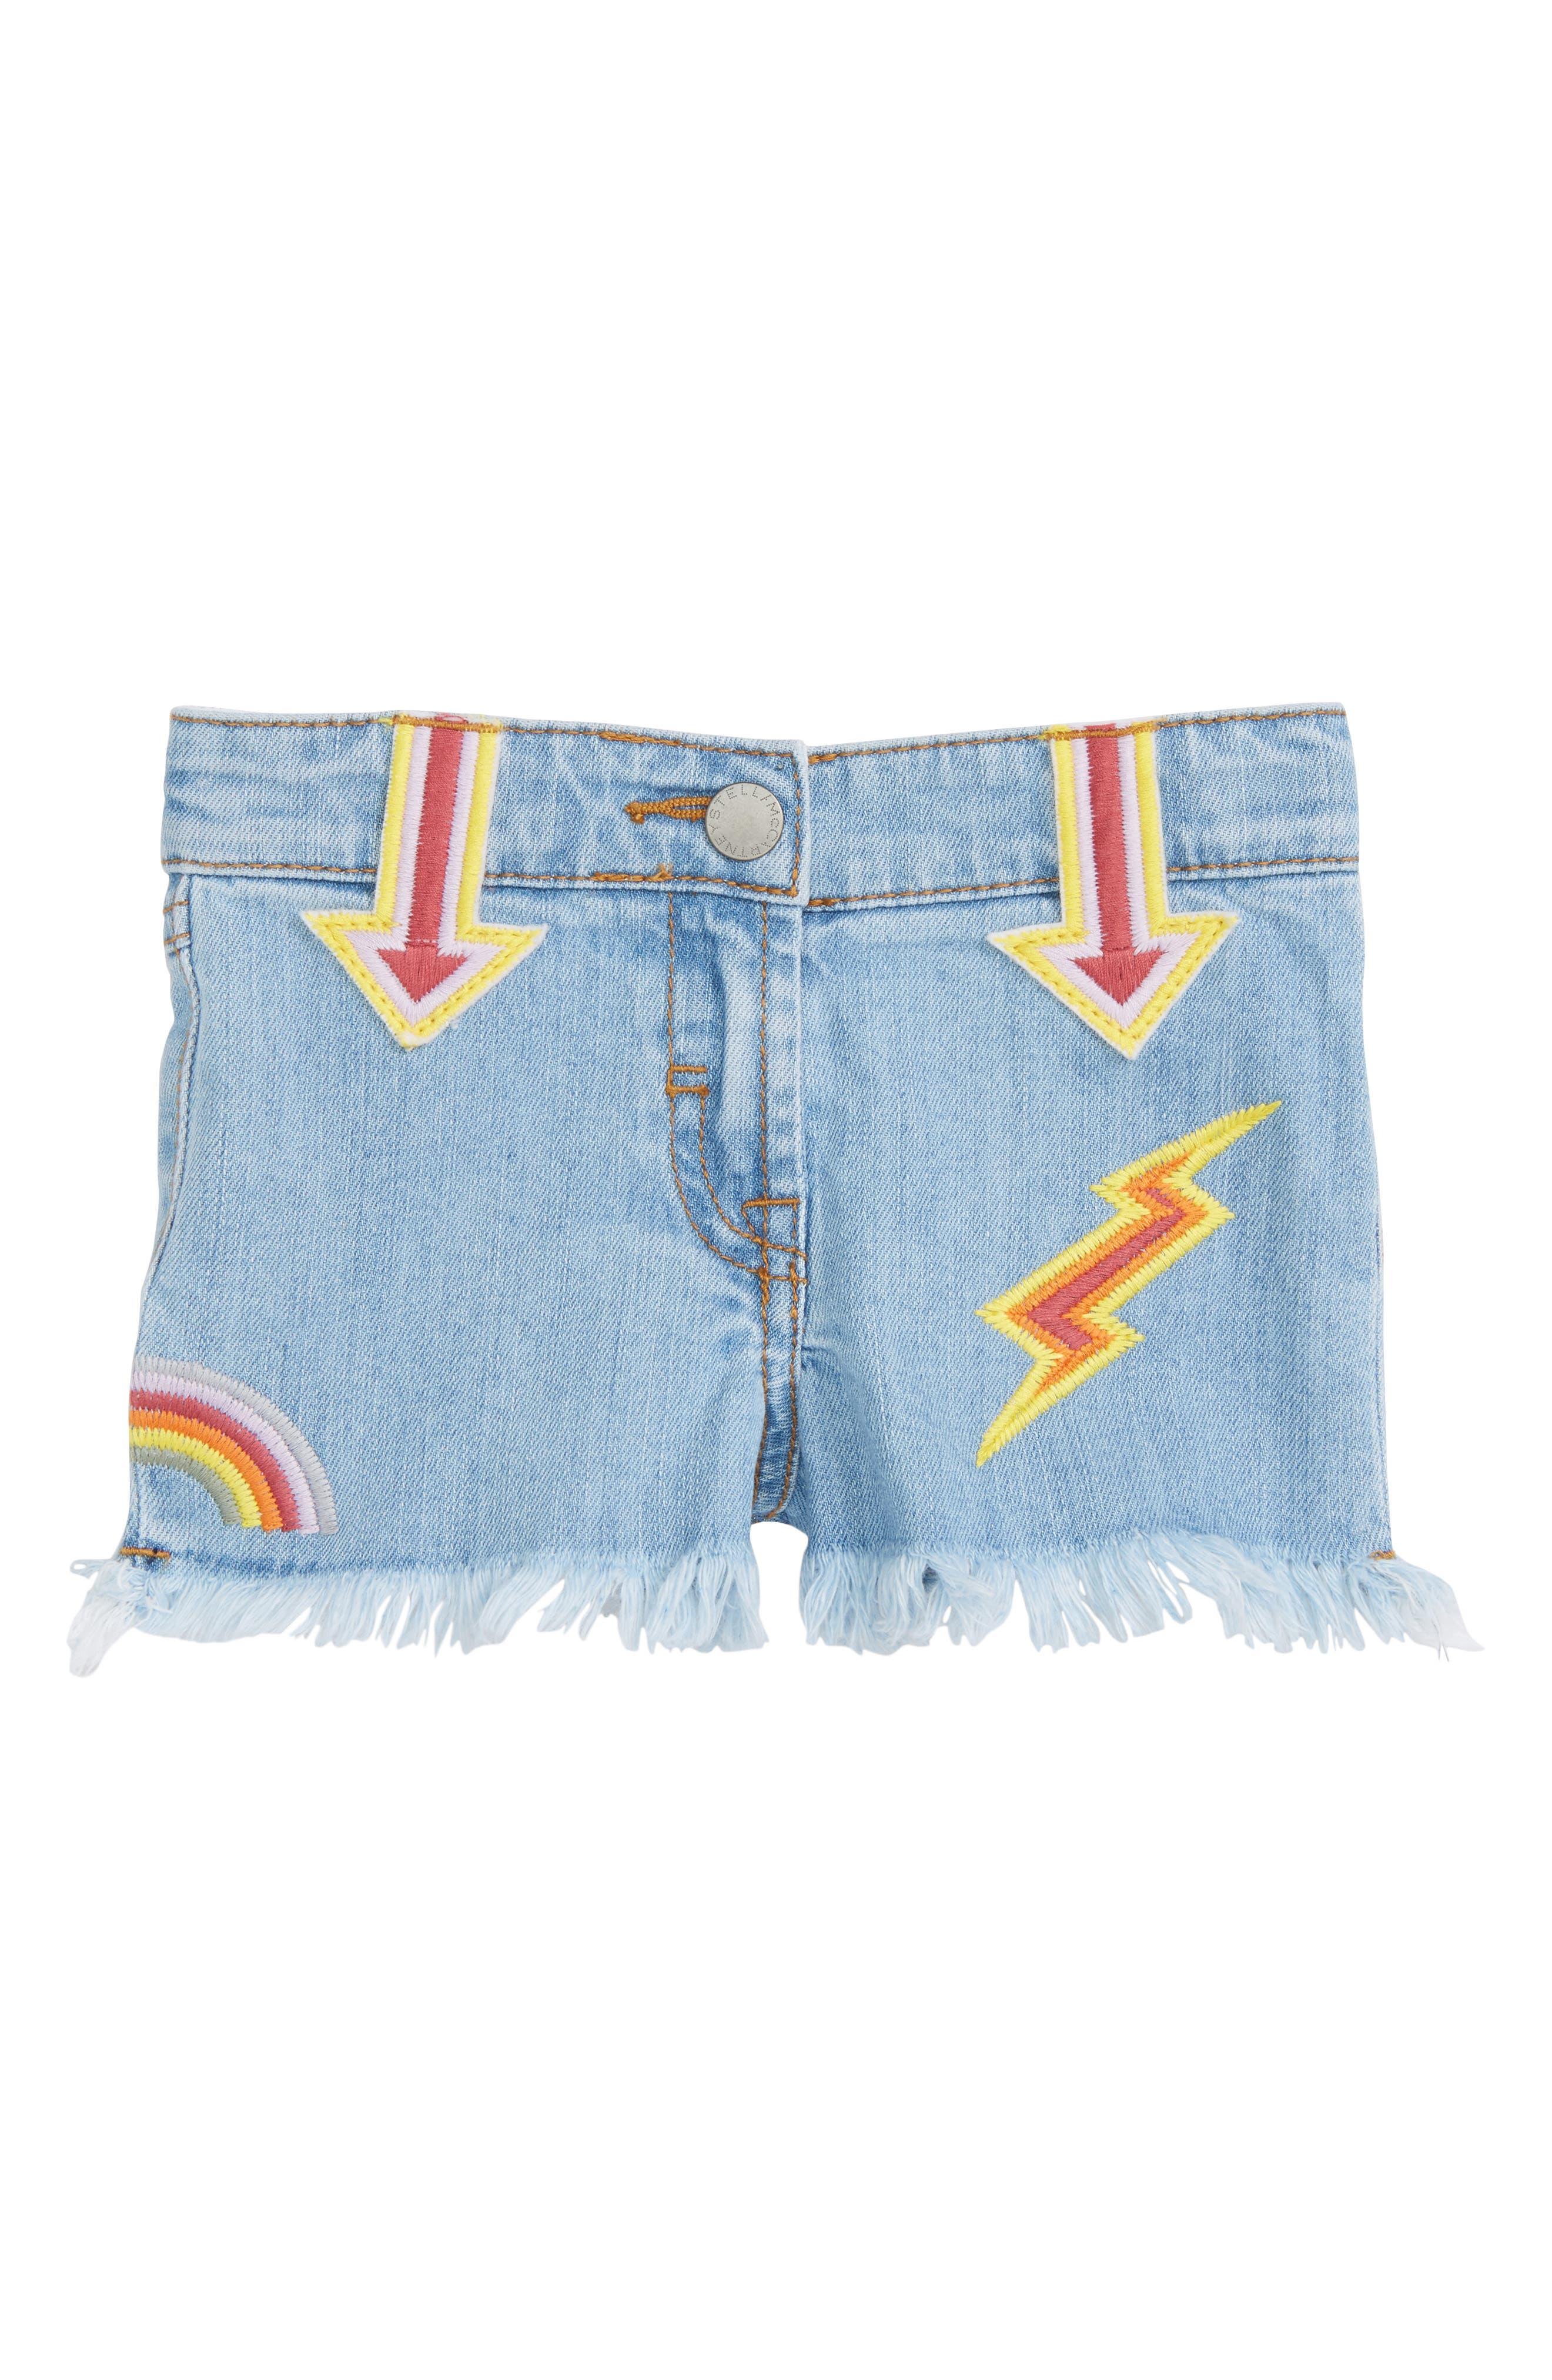 Main Image - Stella McCartney Kids Marlin Patched Cutoff Denim Shorts (Toddler Girls, Little Girls & Big Girls)